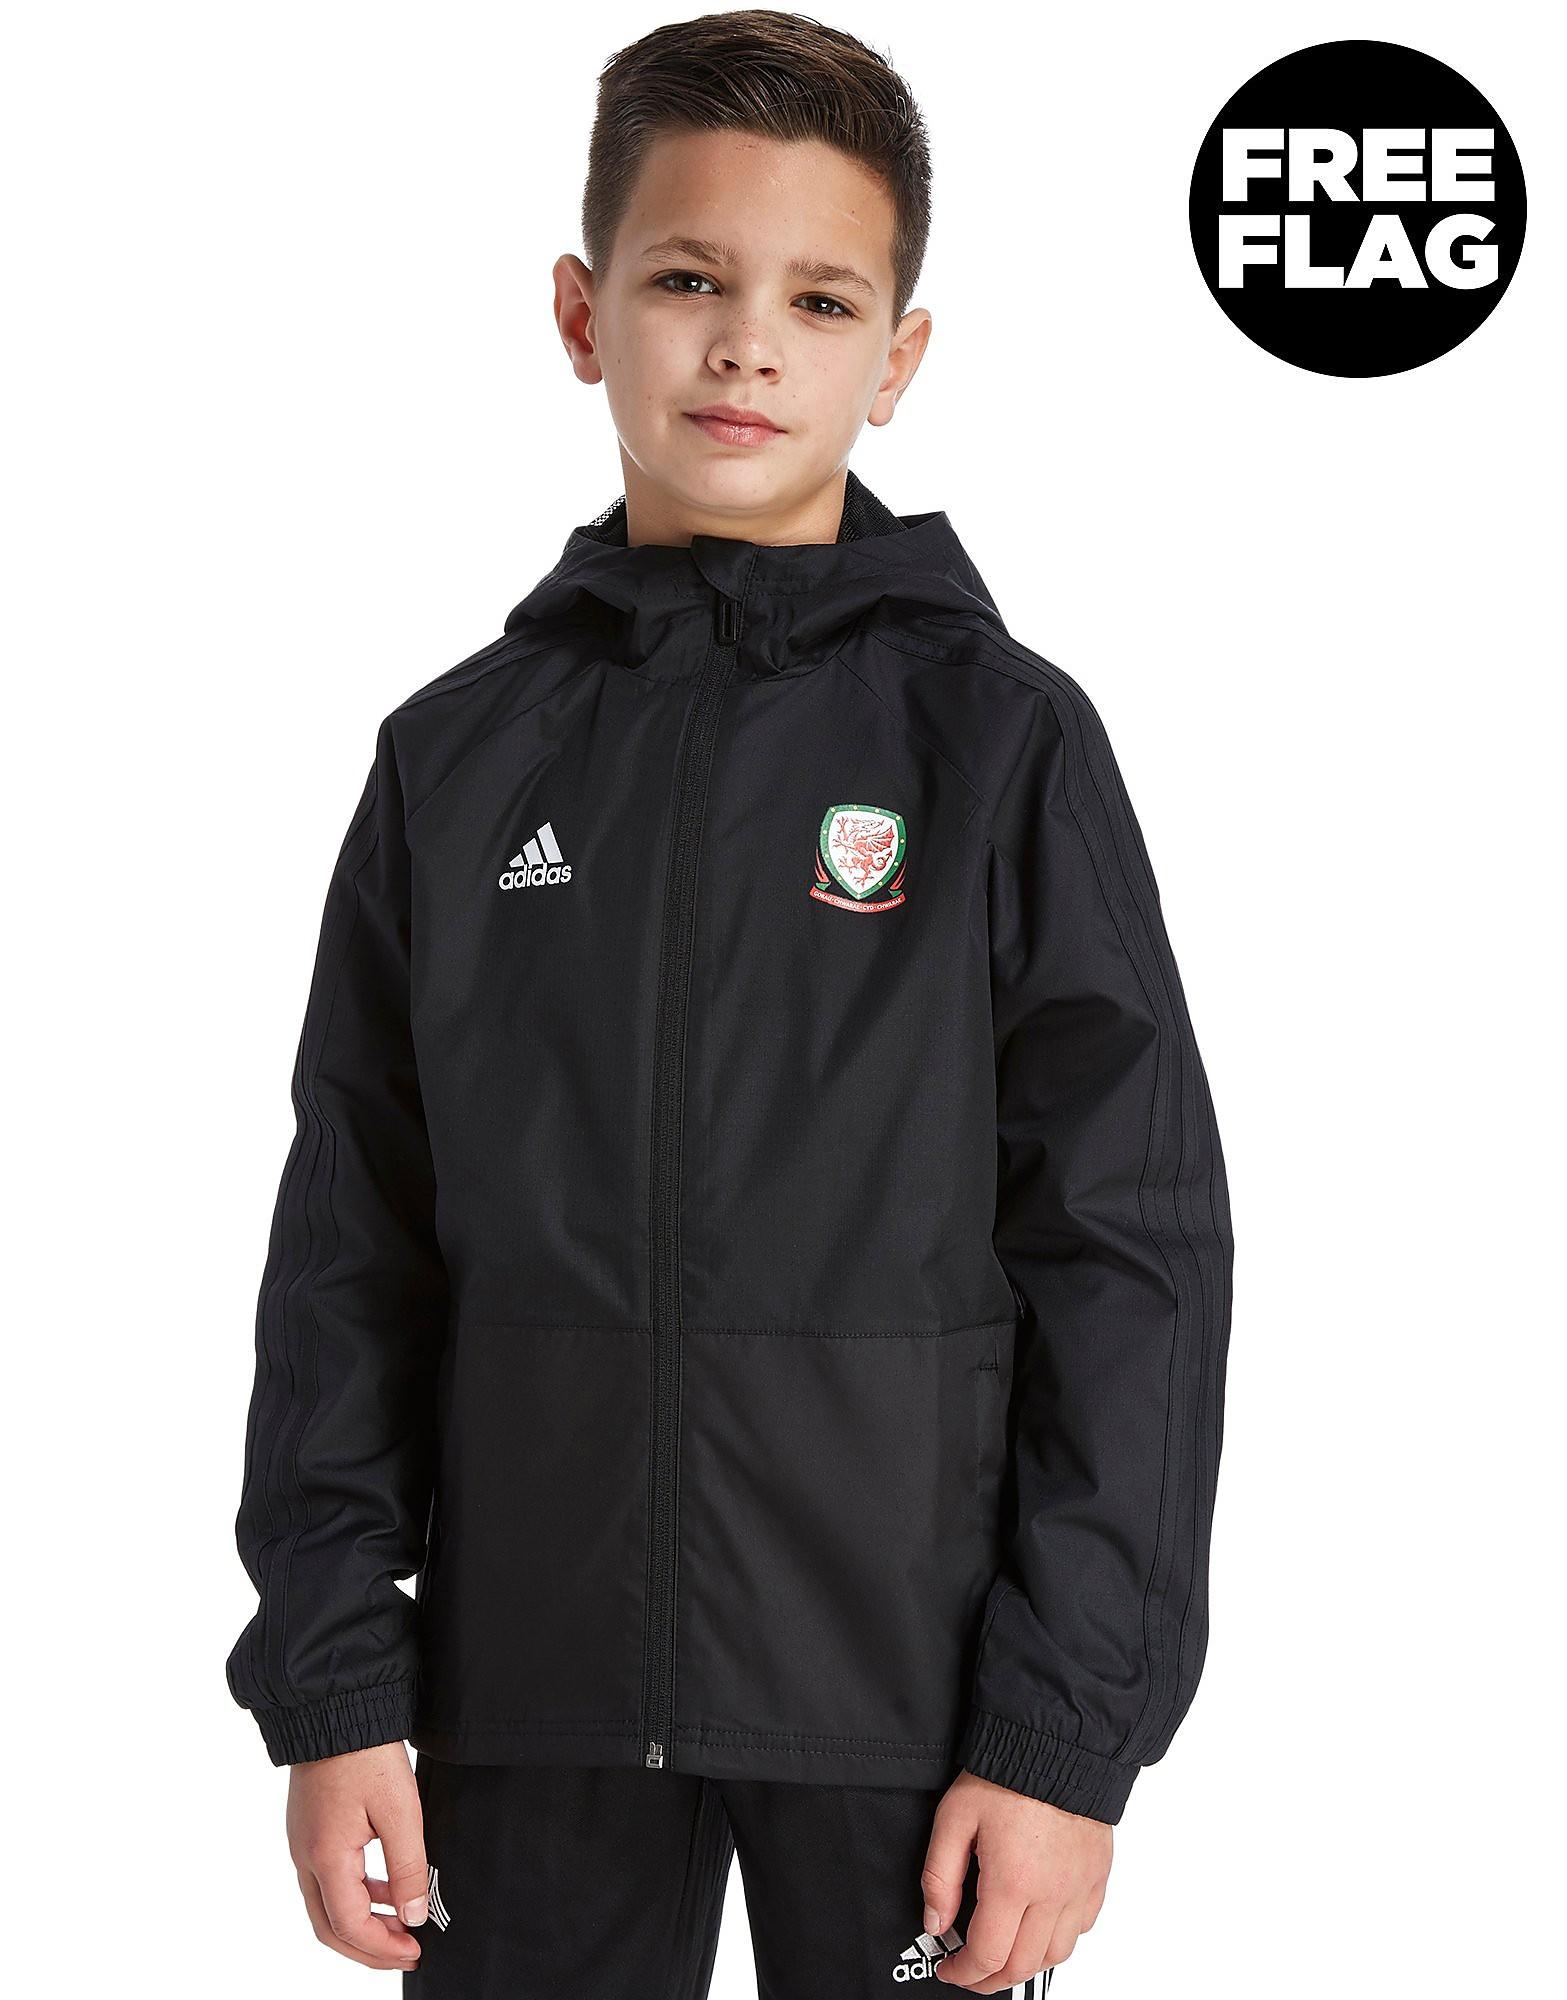 adidas FA Wales 2018 Rain Jacket Junior